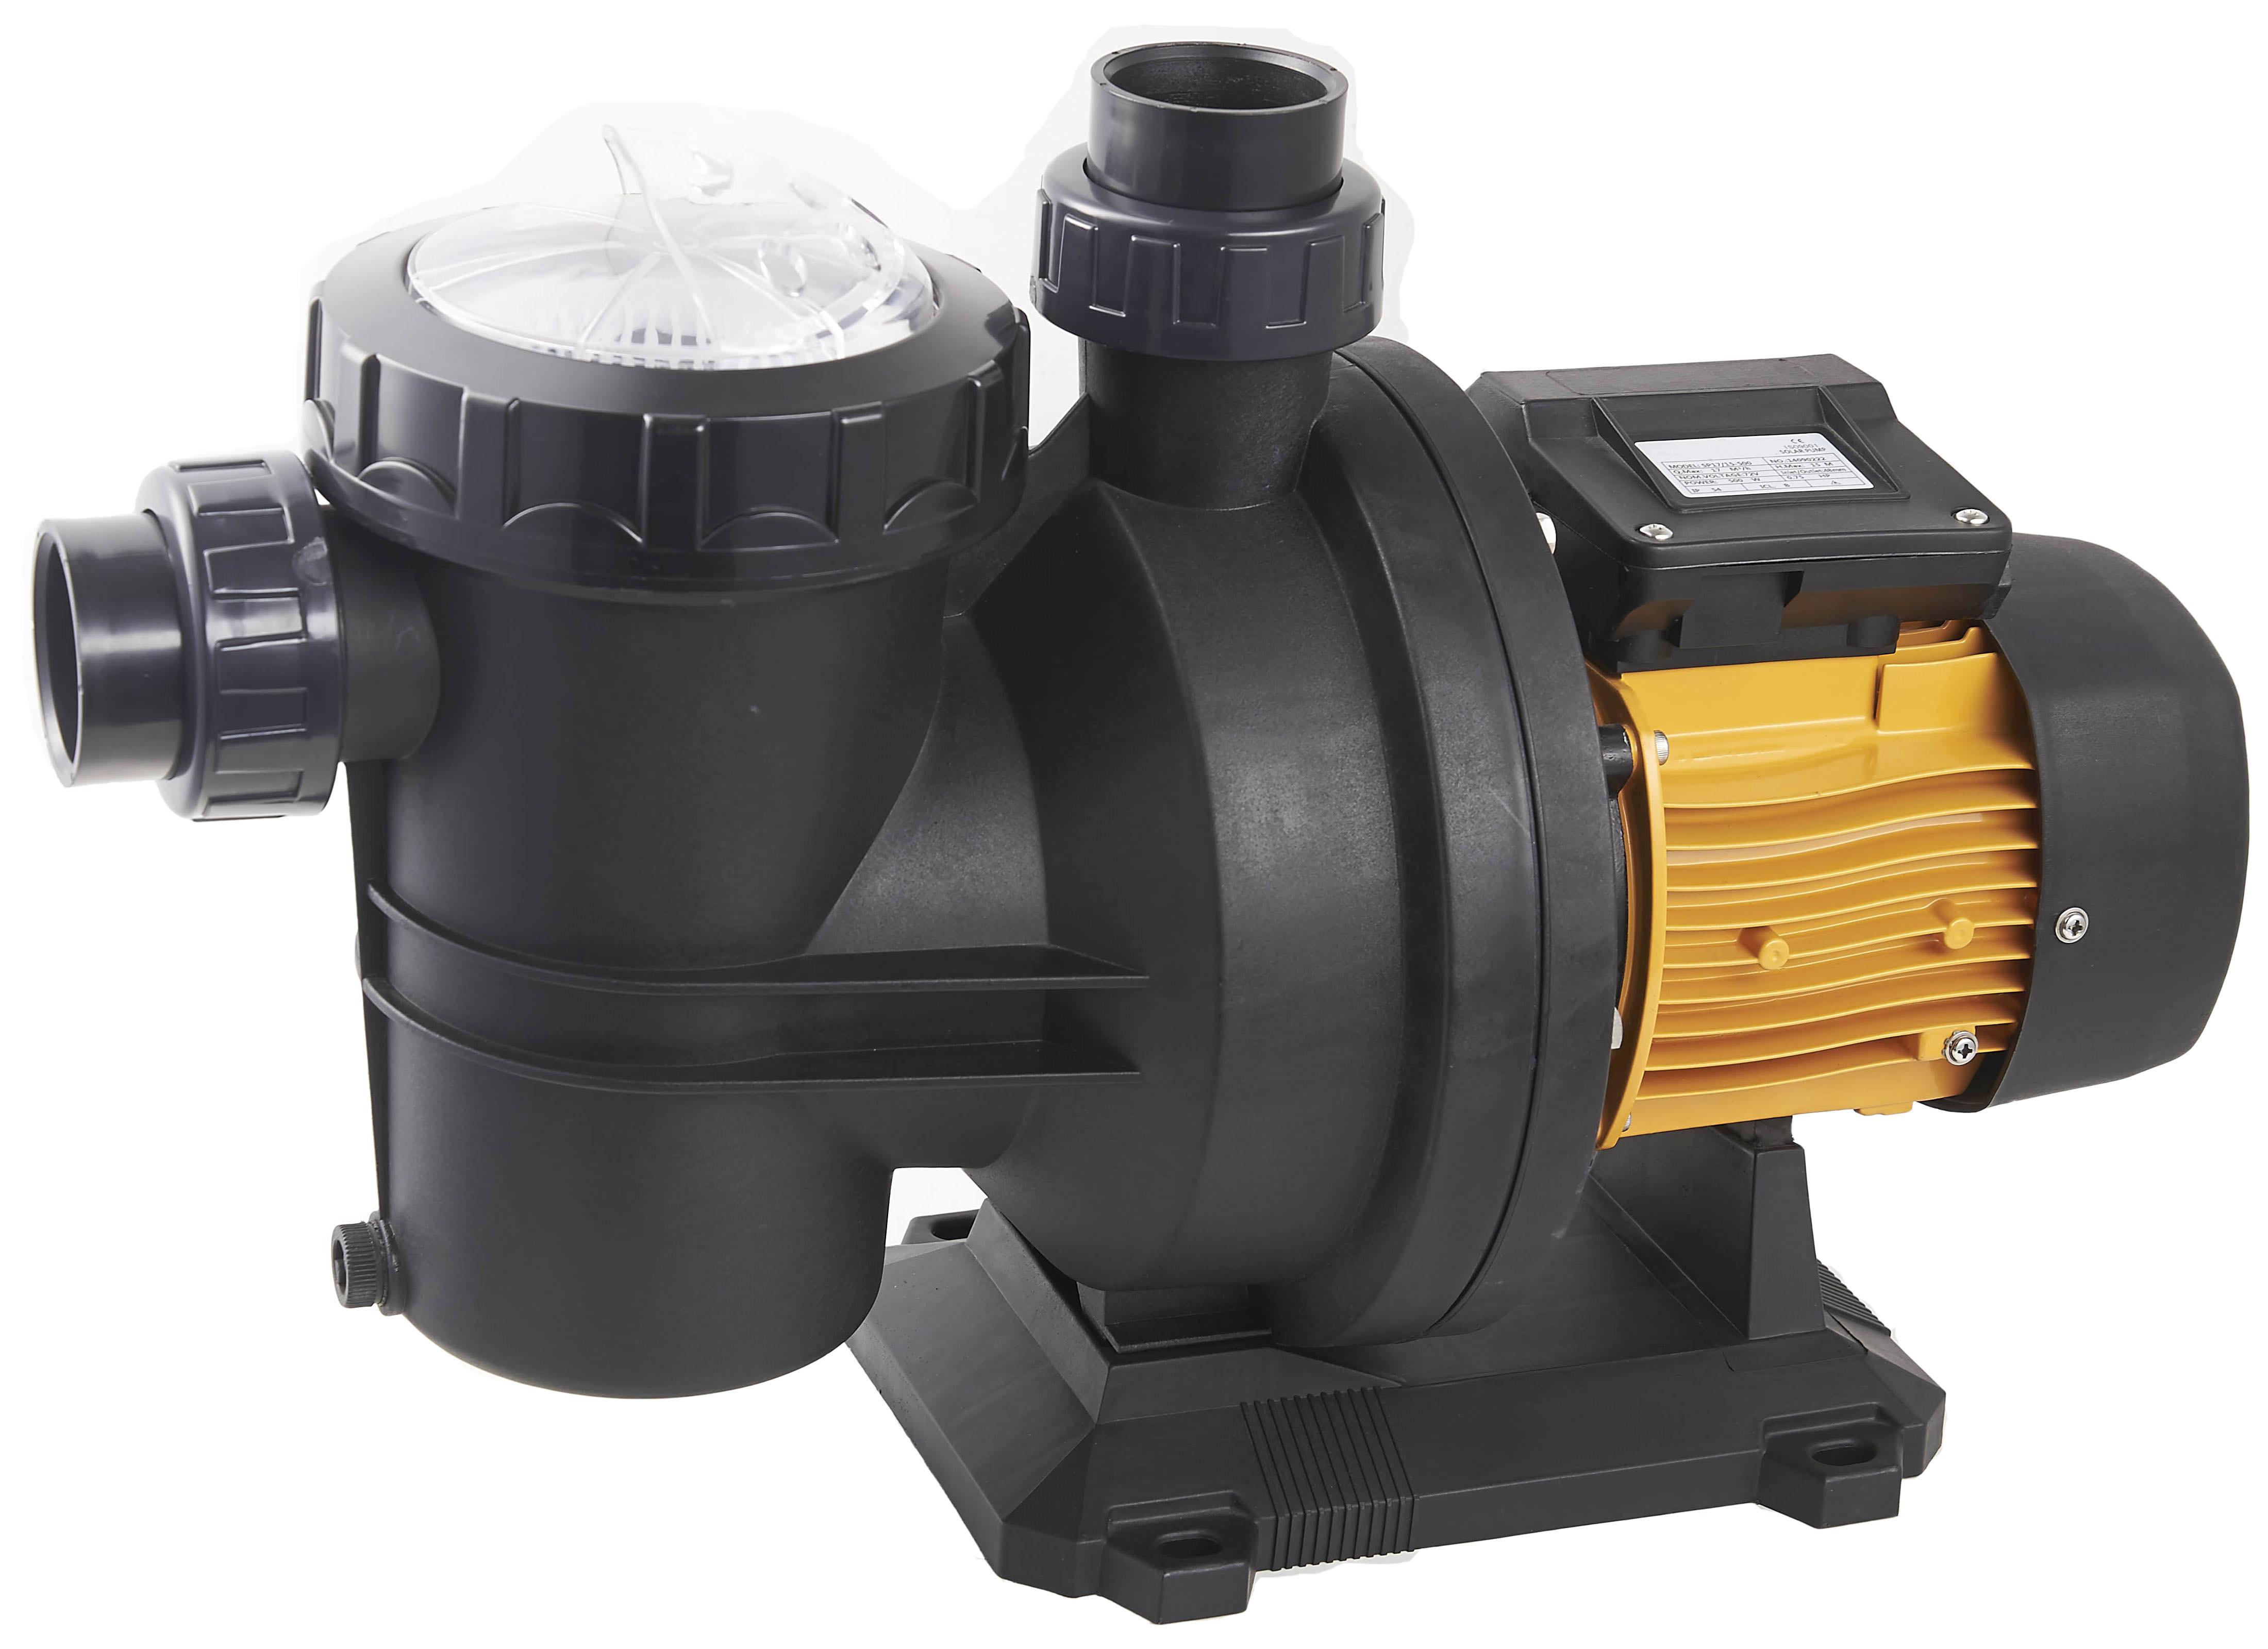 DC 1200W swimming pool pump